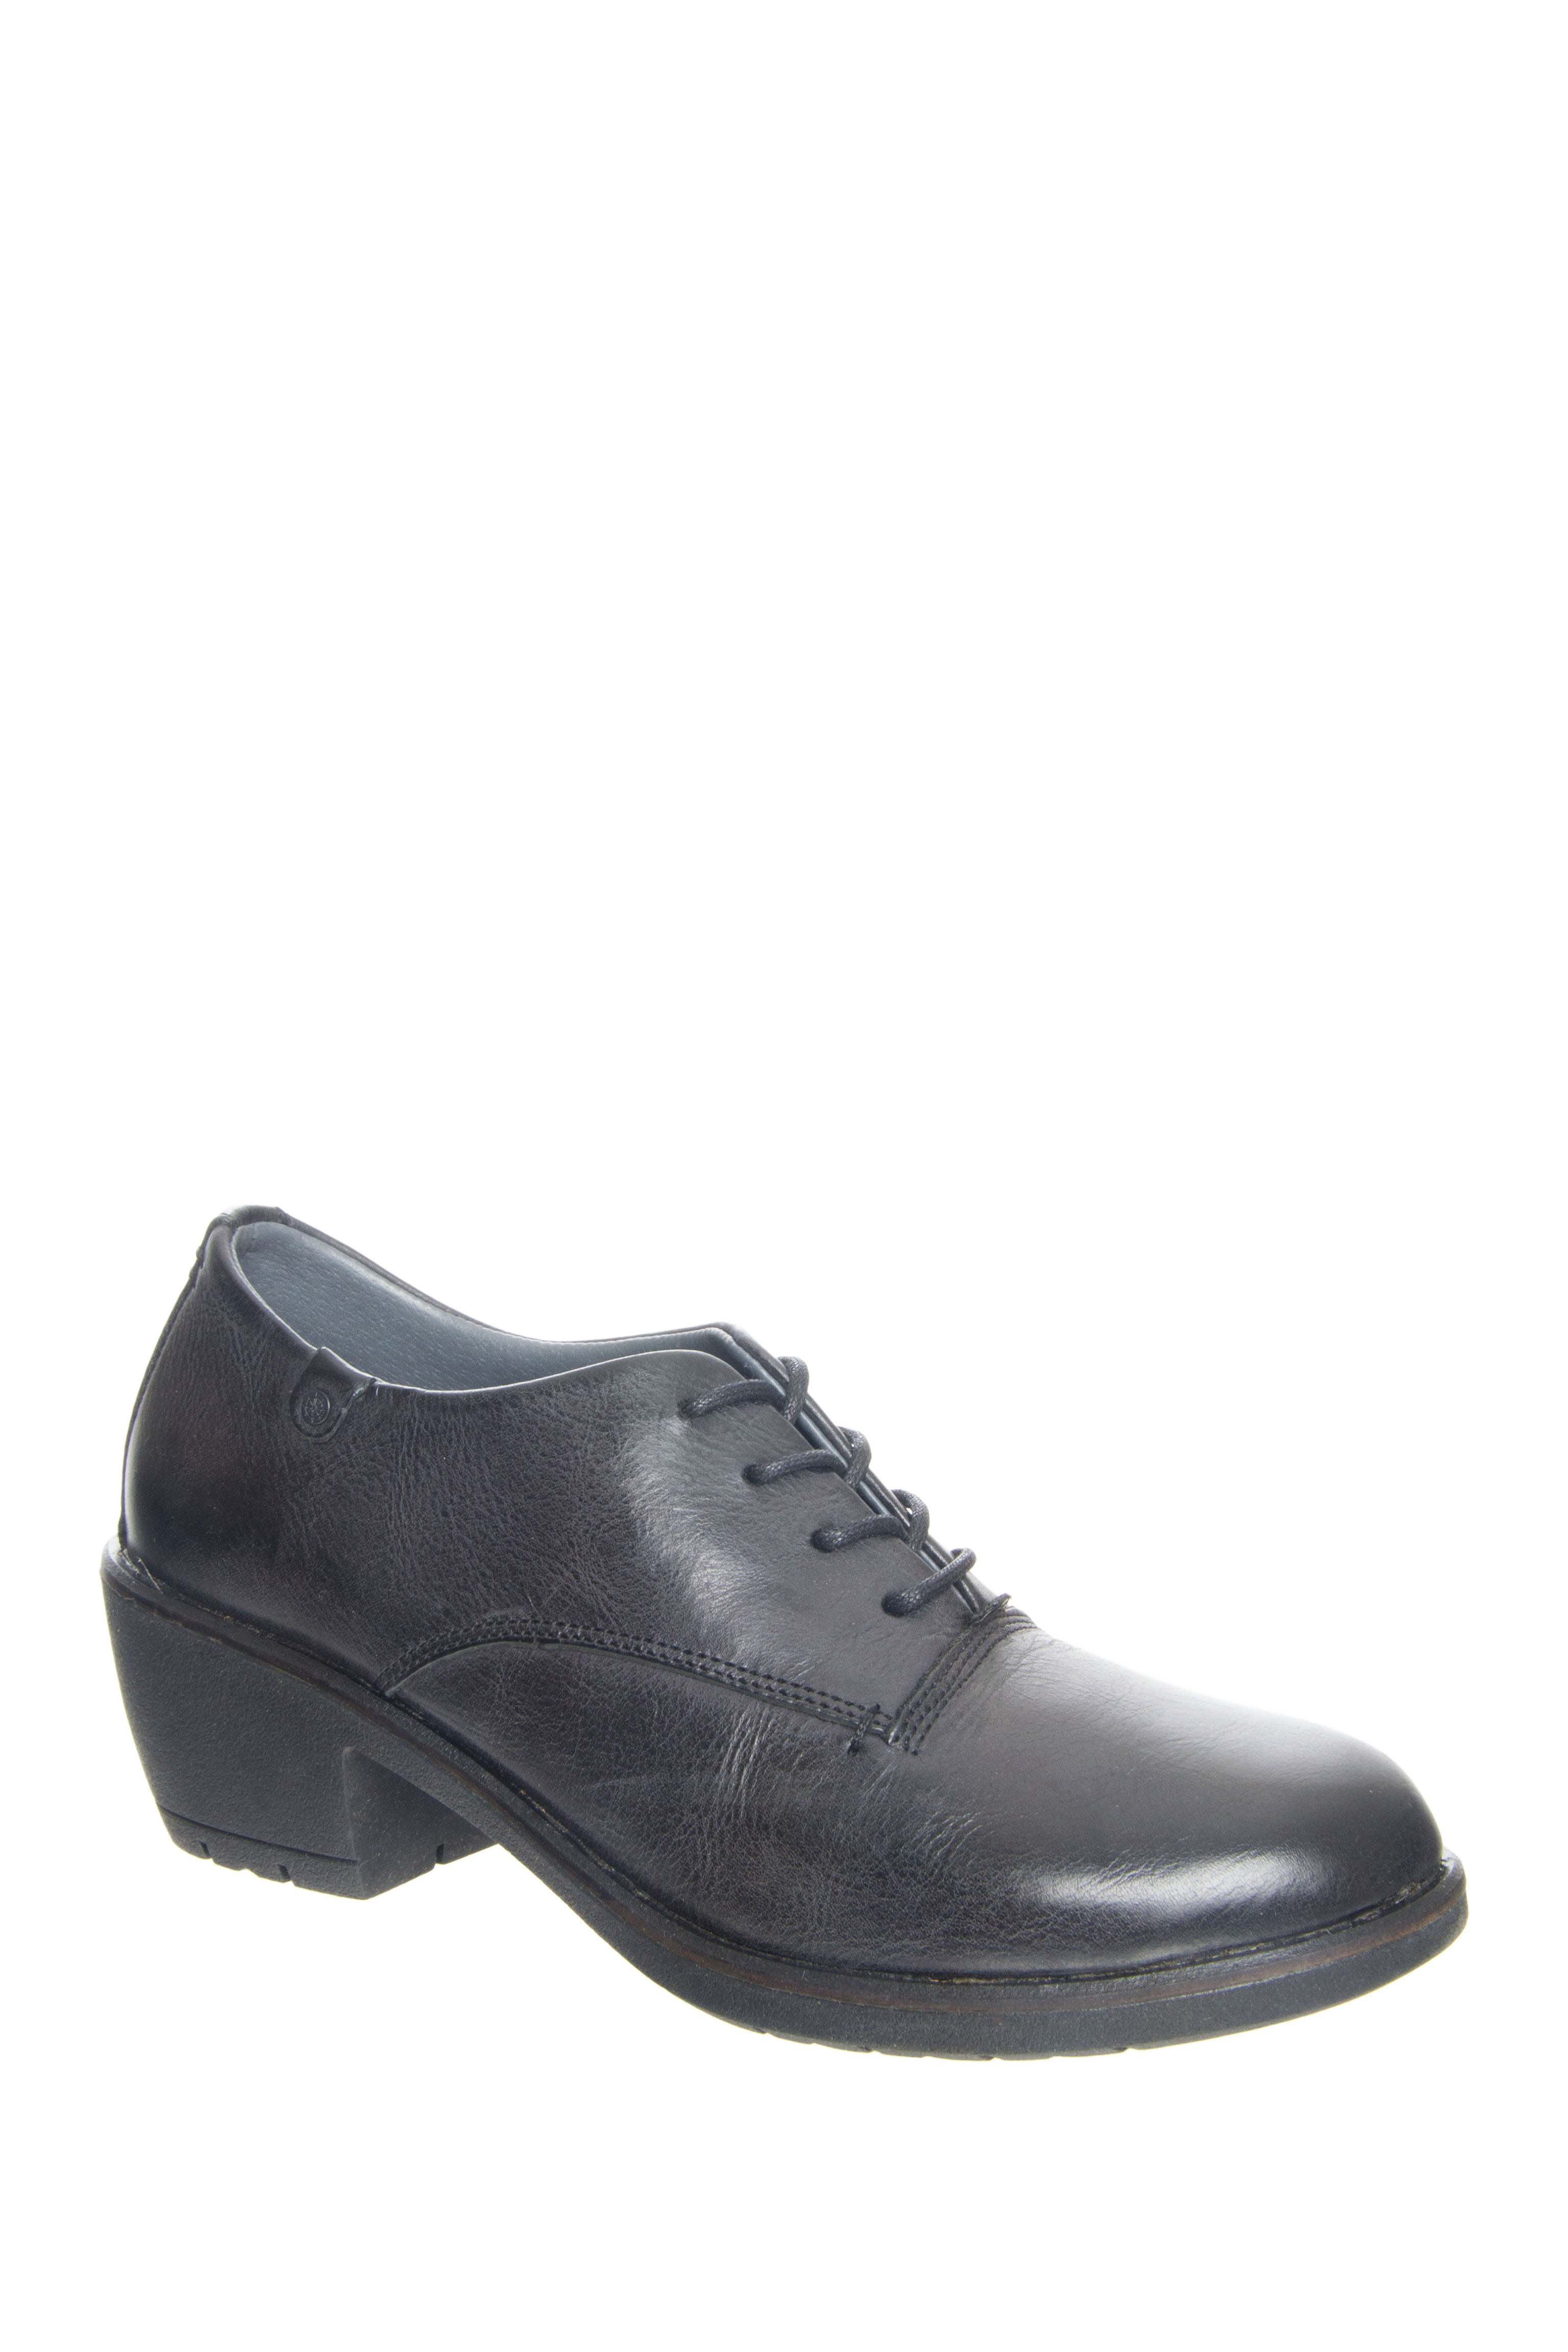 Bussola Shay Mid Heel Oxford - Black